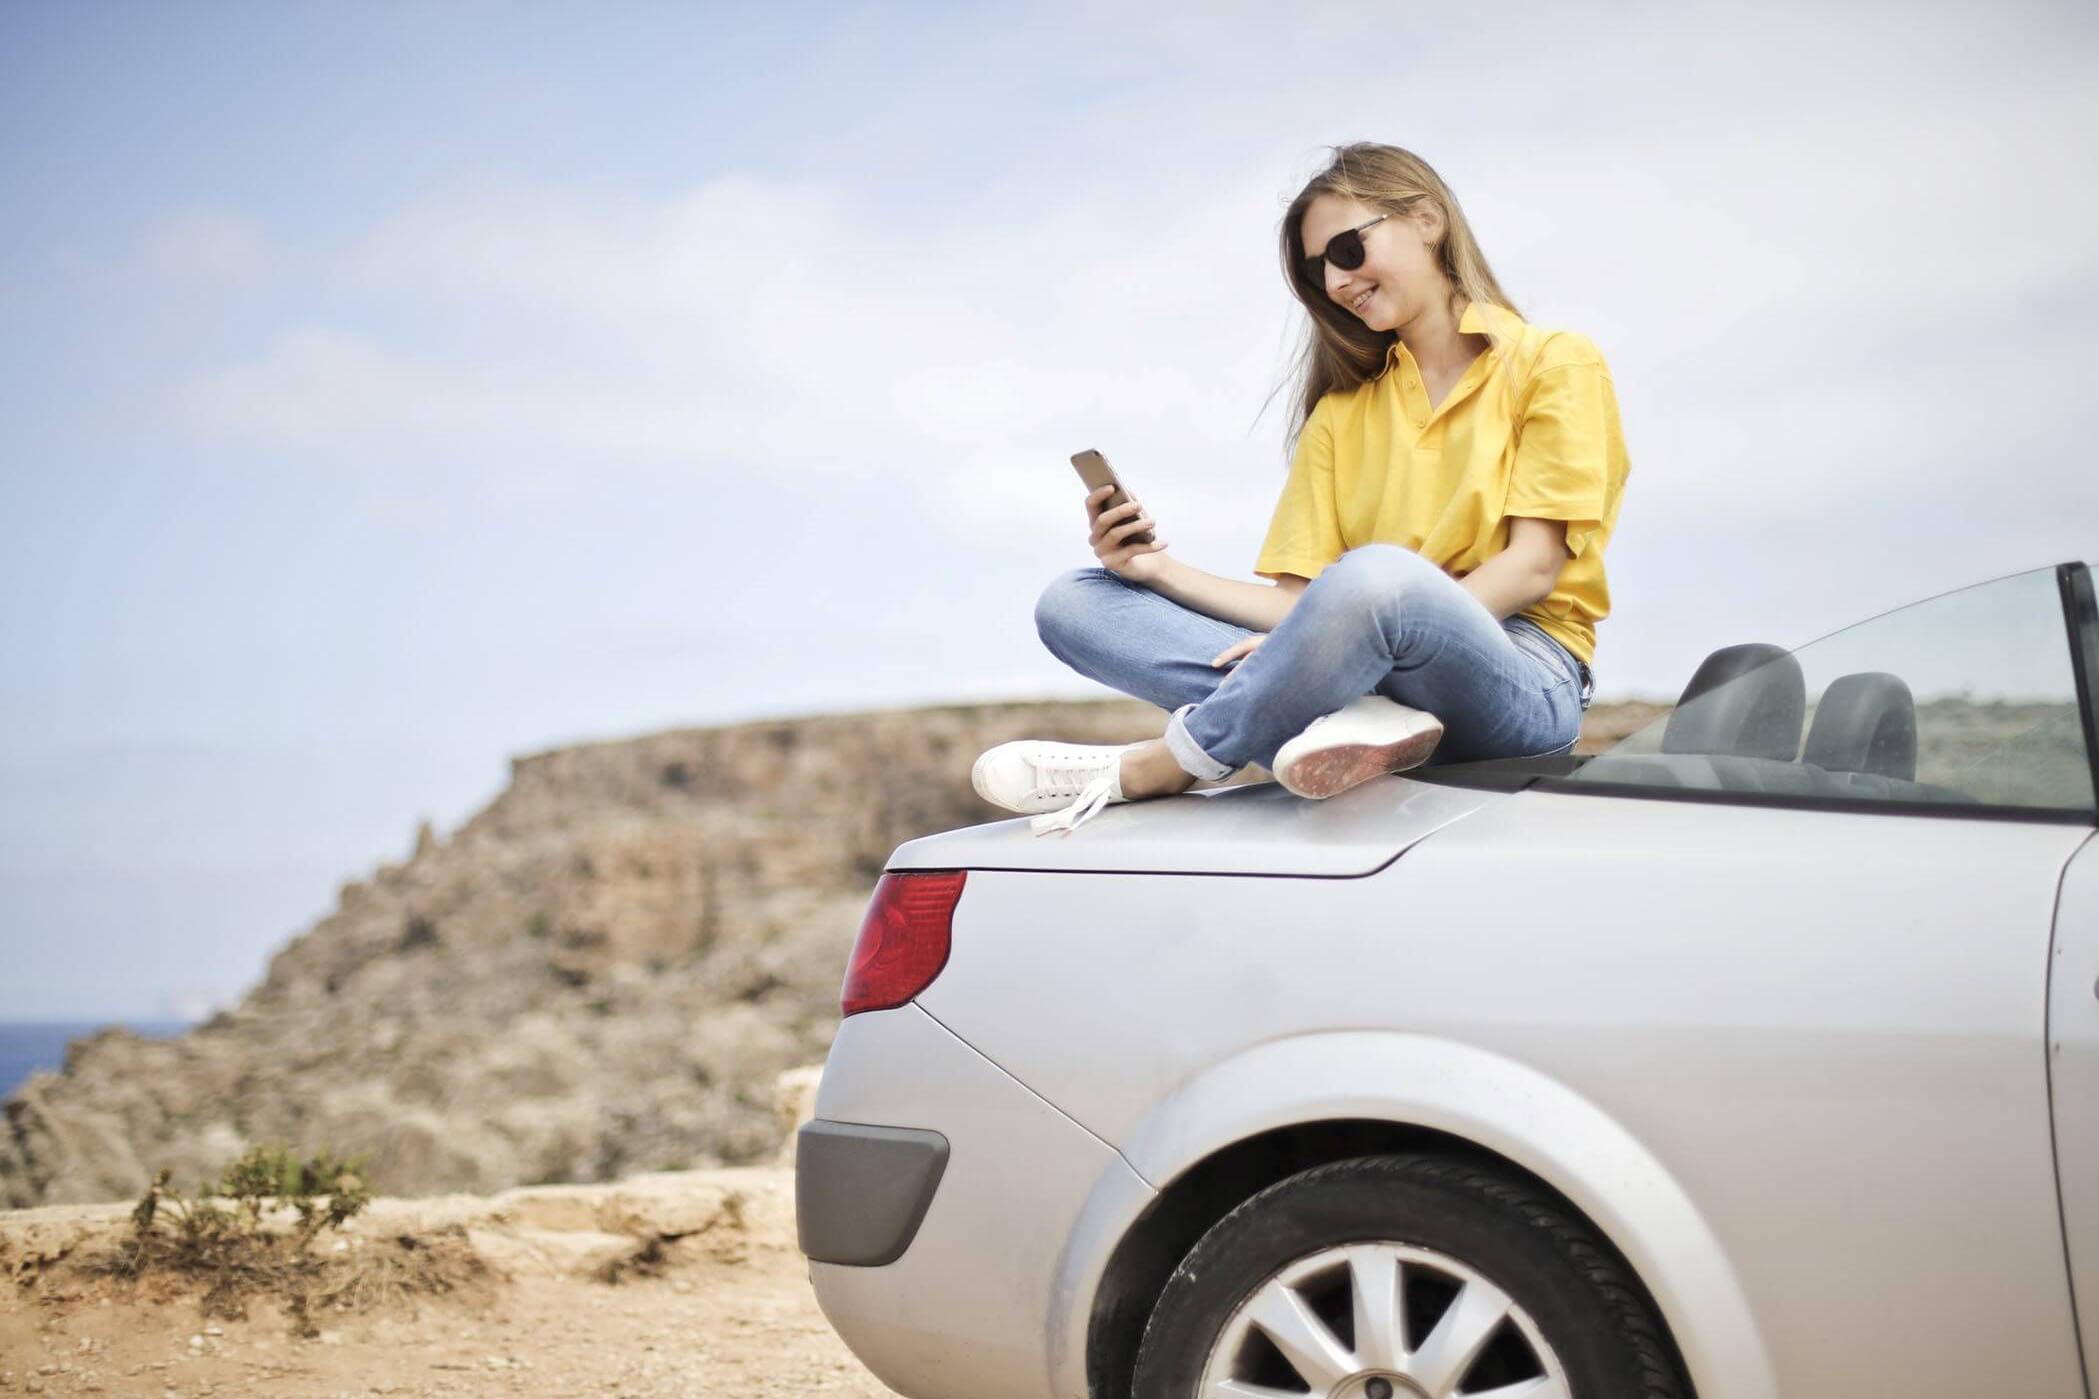 Girl Preparing Road Trip on Car